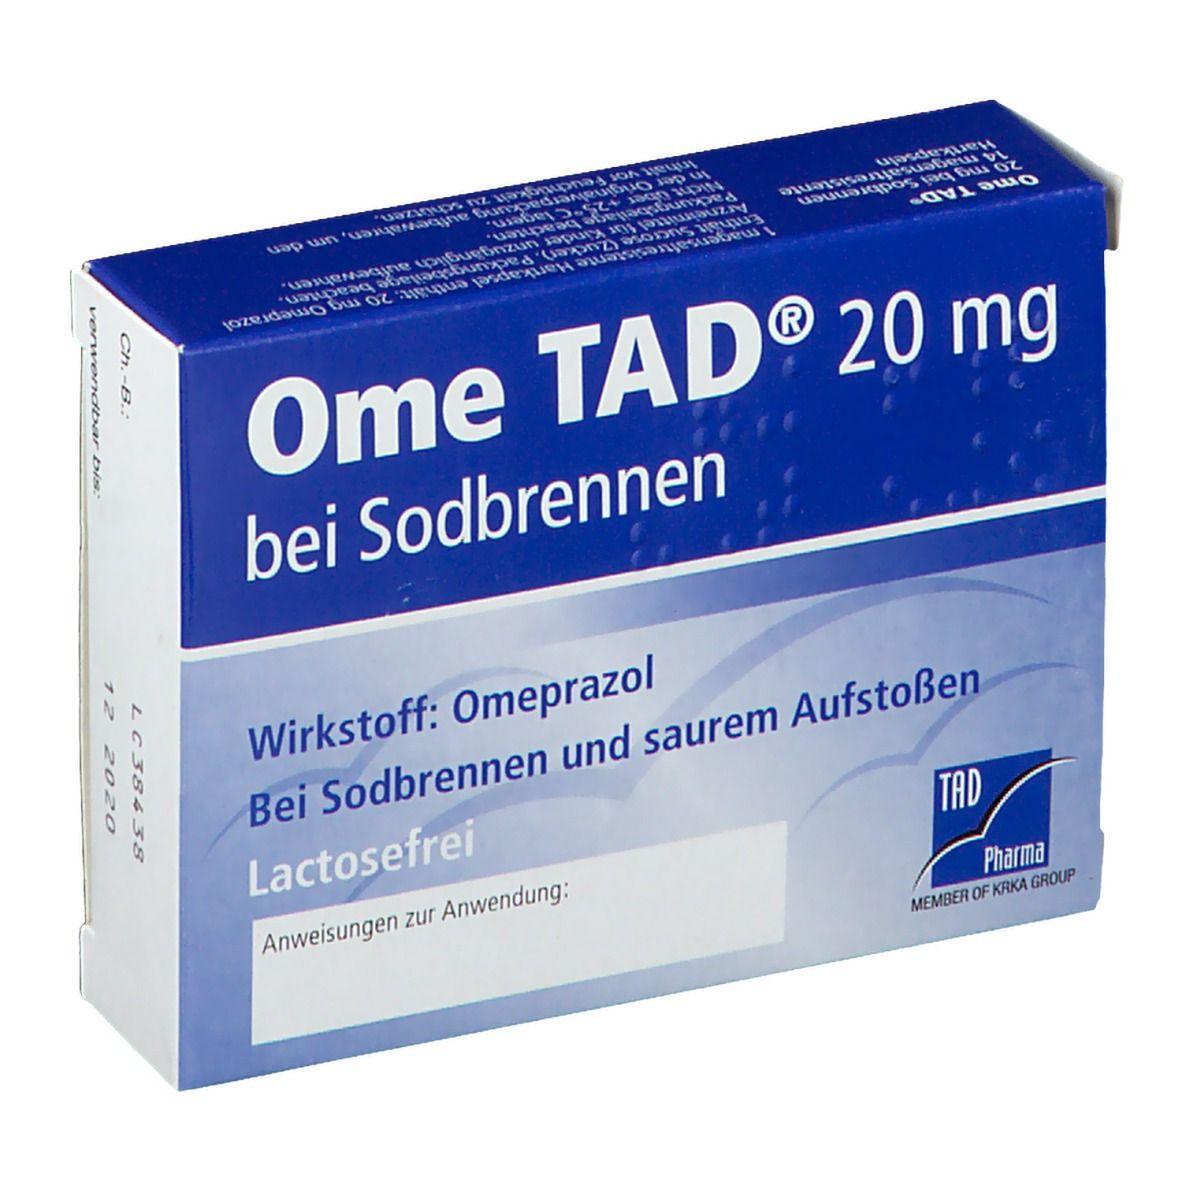 Ome TAD® 20 mg Kapseln bei Sodbrennen